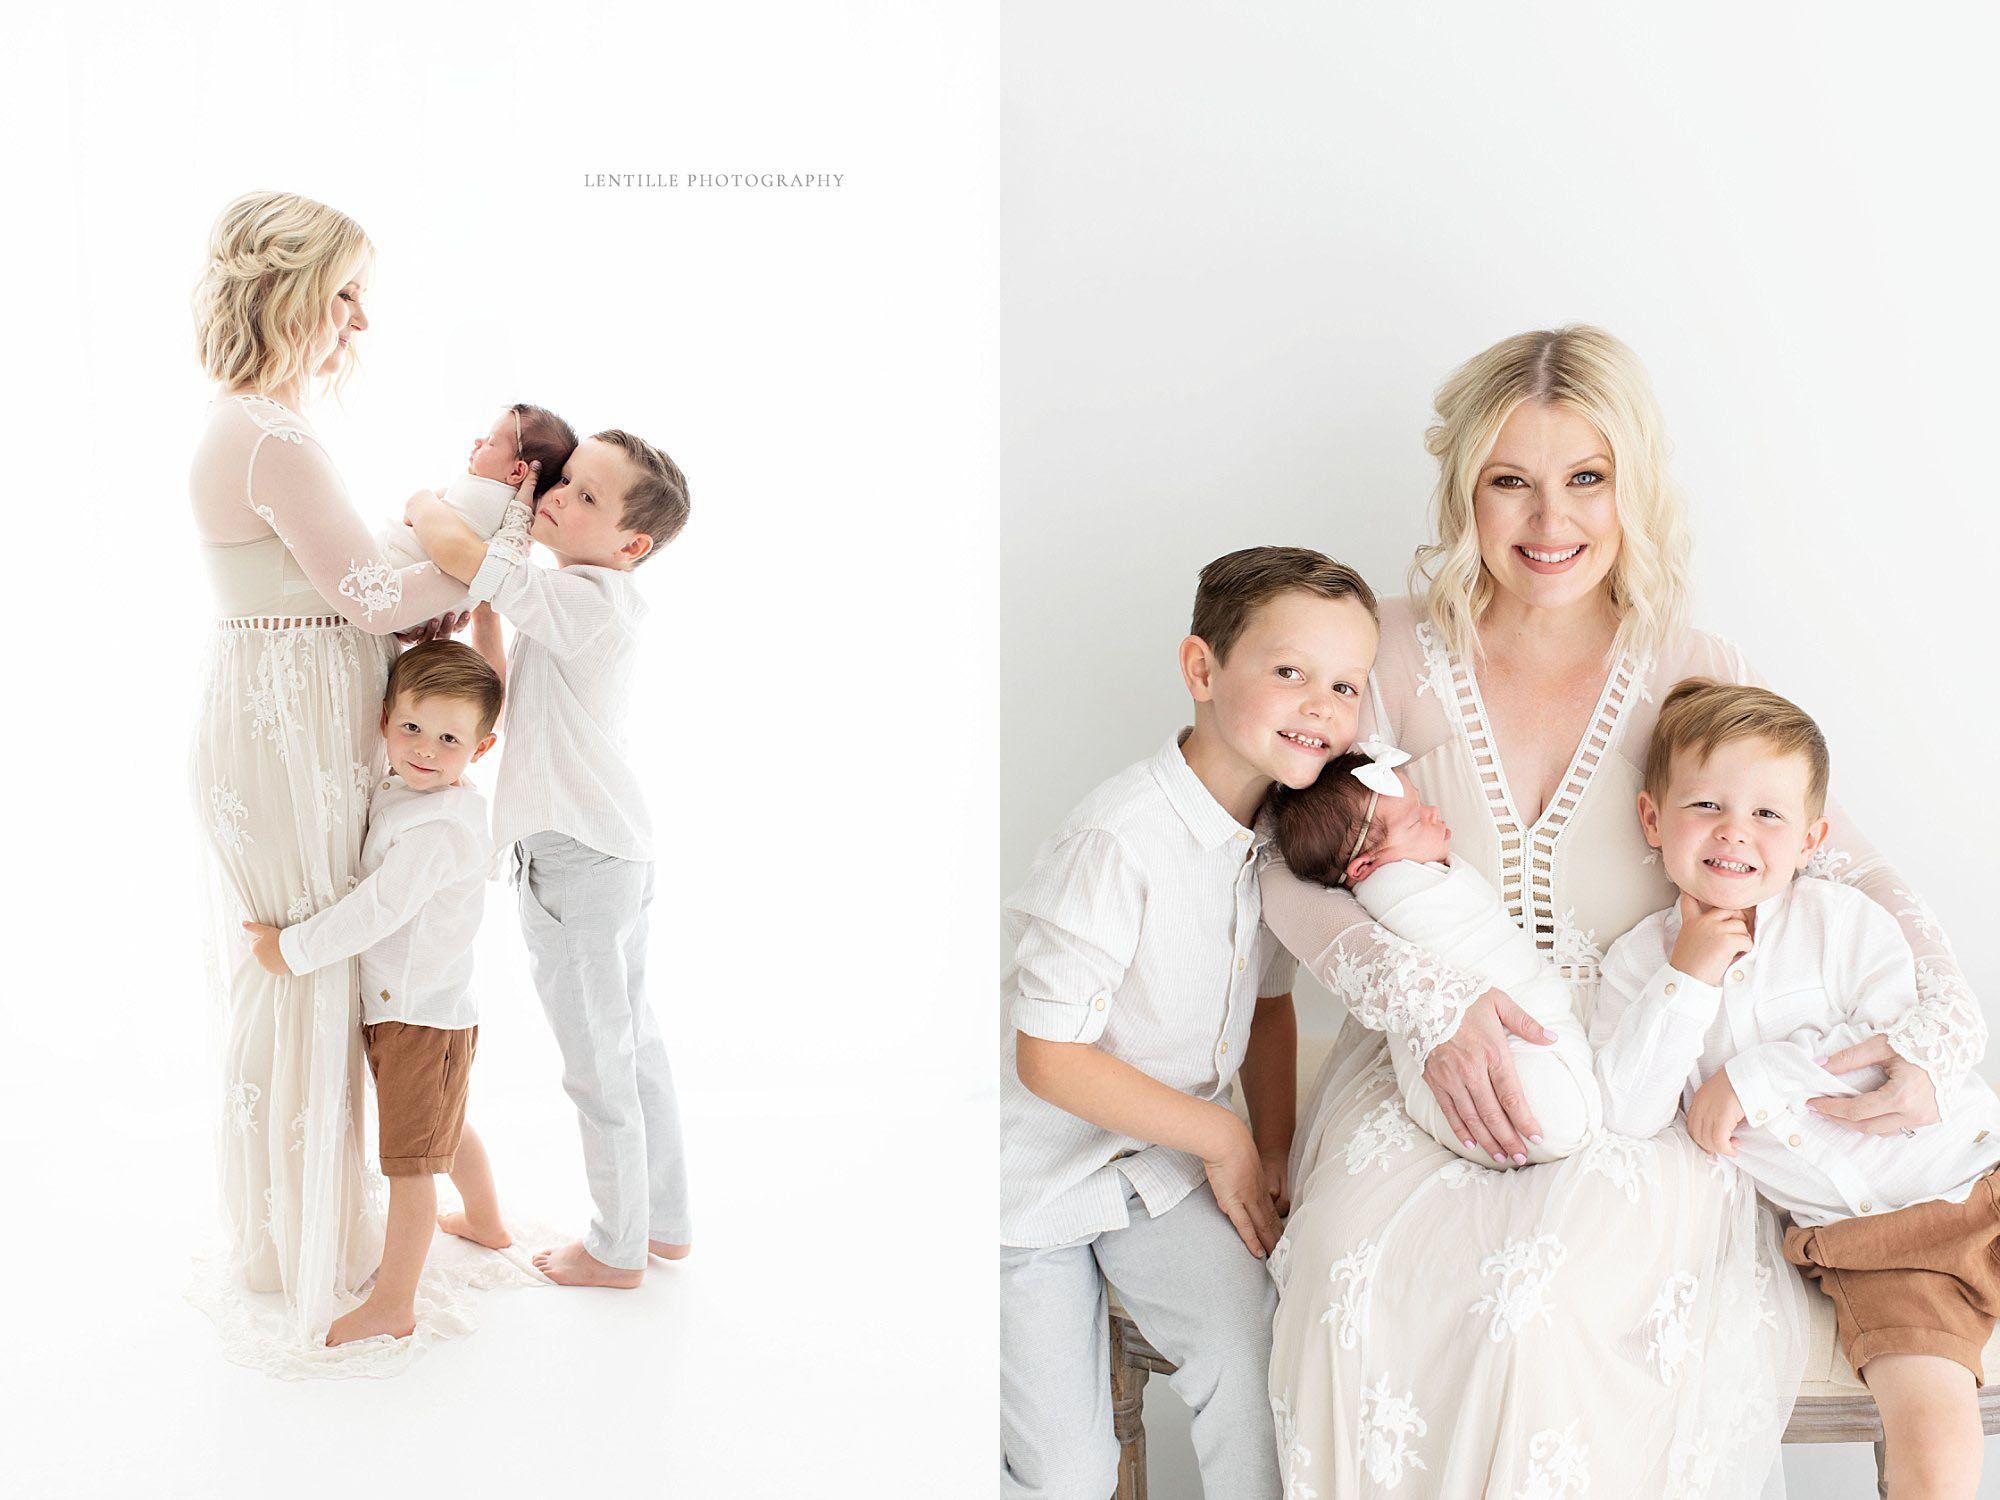 Best Newborn Photographer Near Me Farr Newborn Photographer Motherhood Photography Photographers Near Me